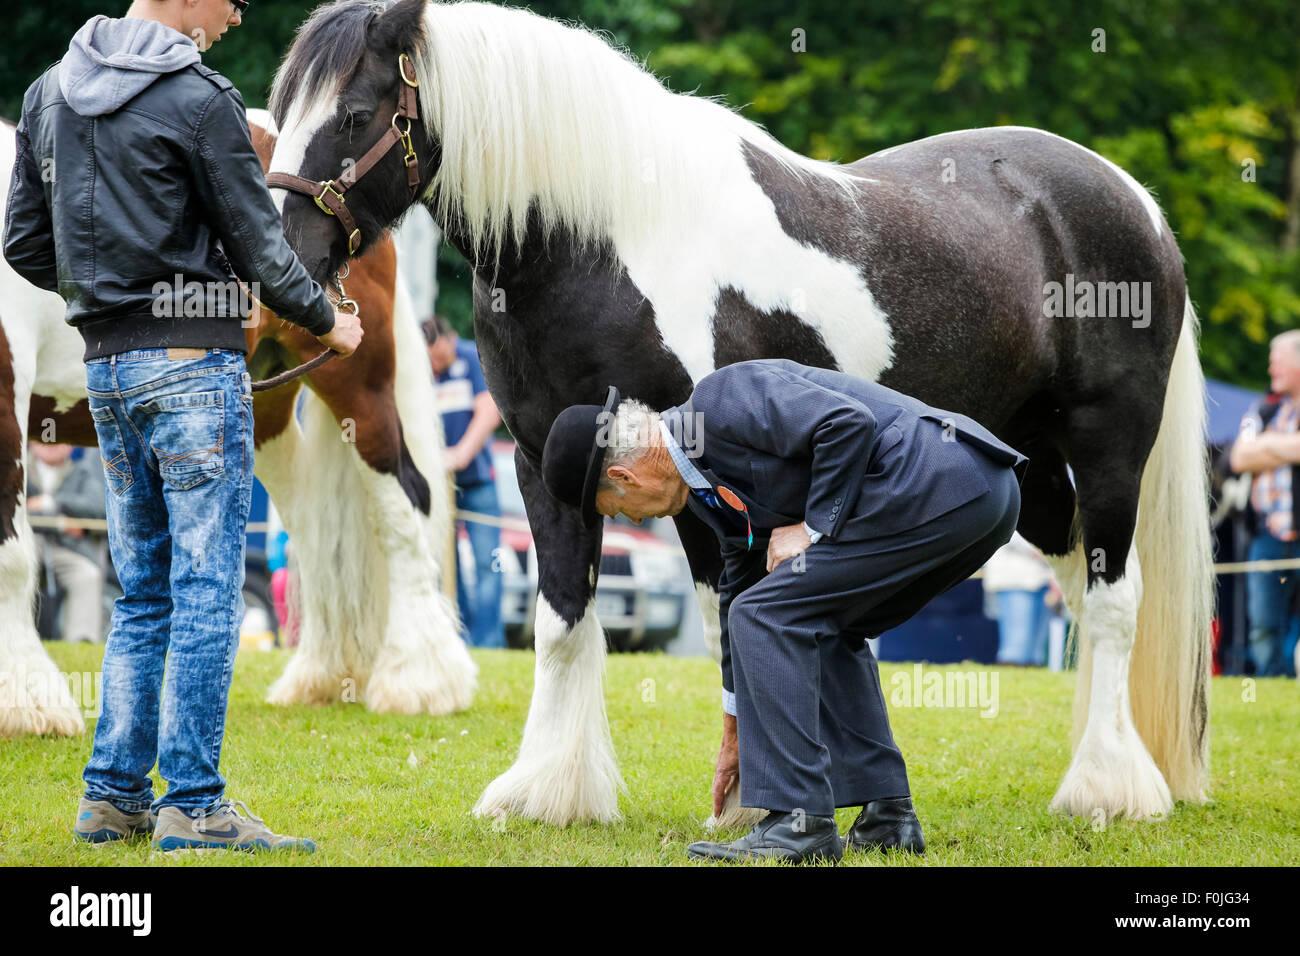 Un juge examine les chevaux hoof au Native et races traditionnelles Show, Ulster Folk Museum, Holywood, Irlande Photo Stock